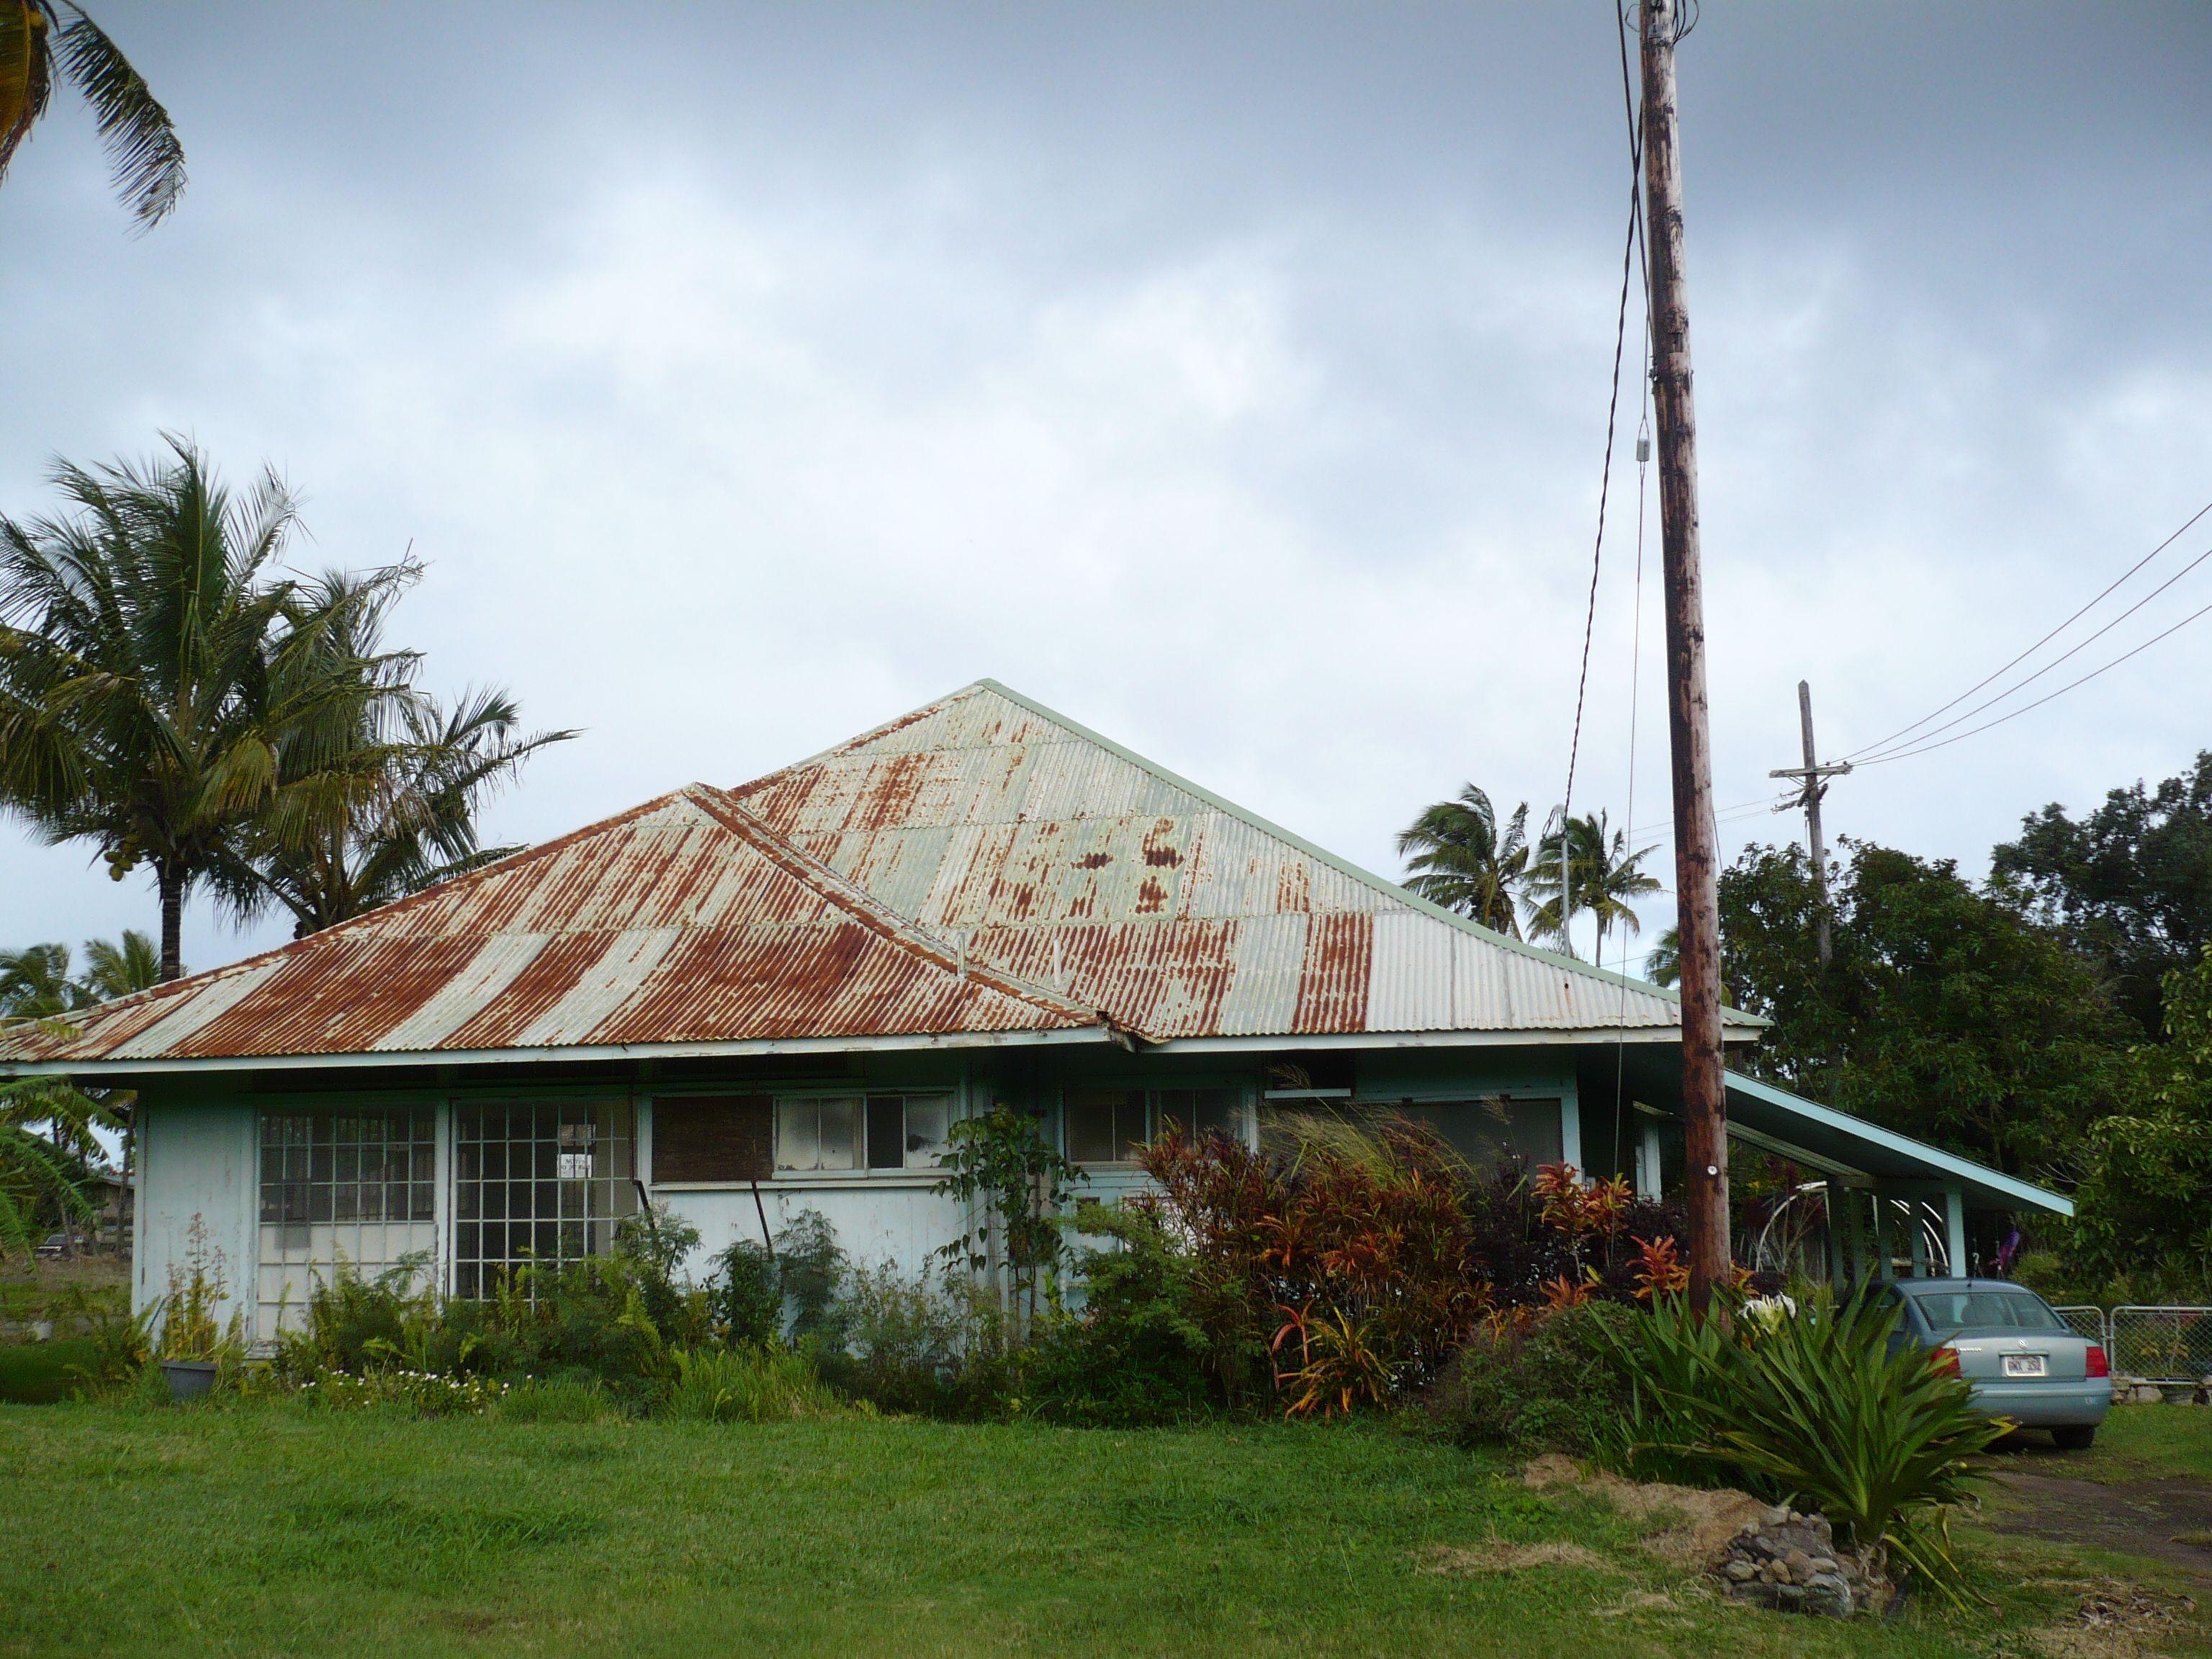 Pin By Ziyuan Tian On Hawaii Beach Store In 2020 Hawaii Homes Tin Roof House Island Living